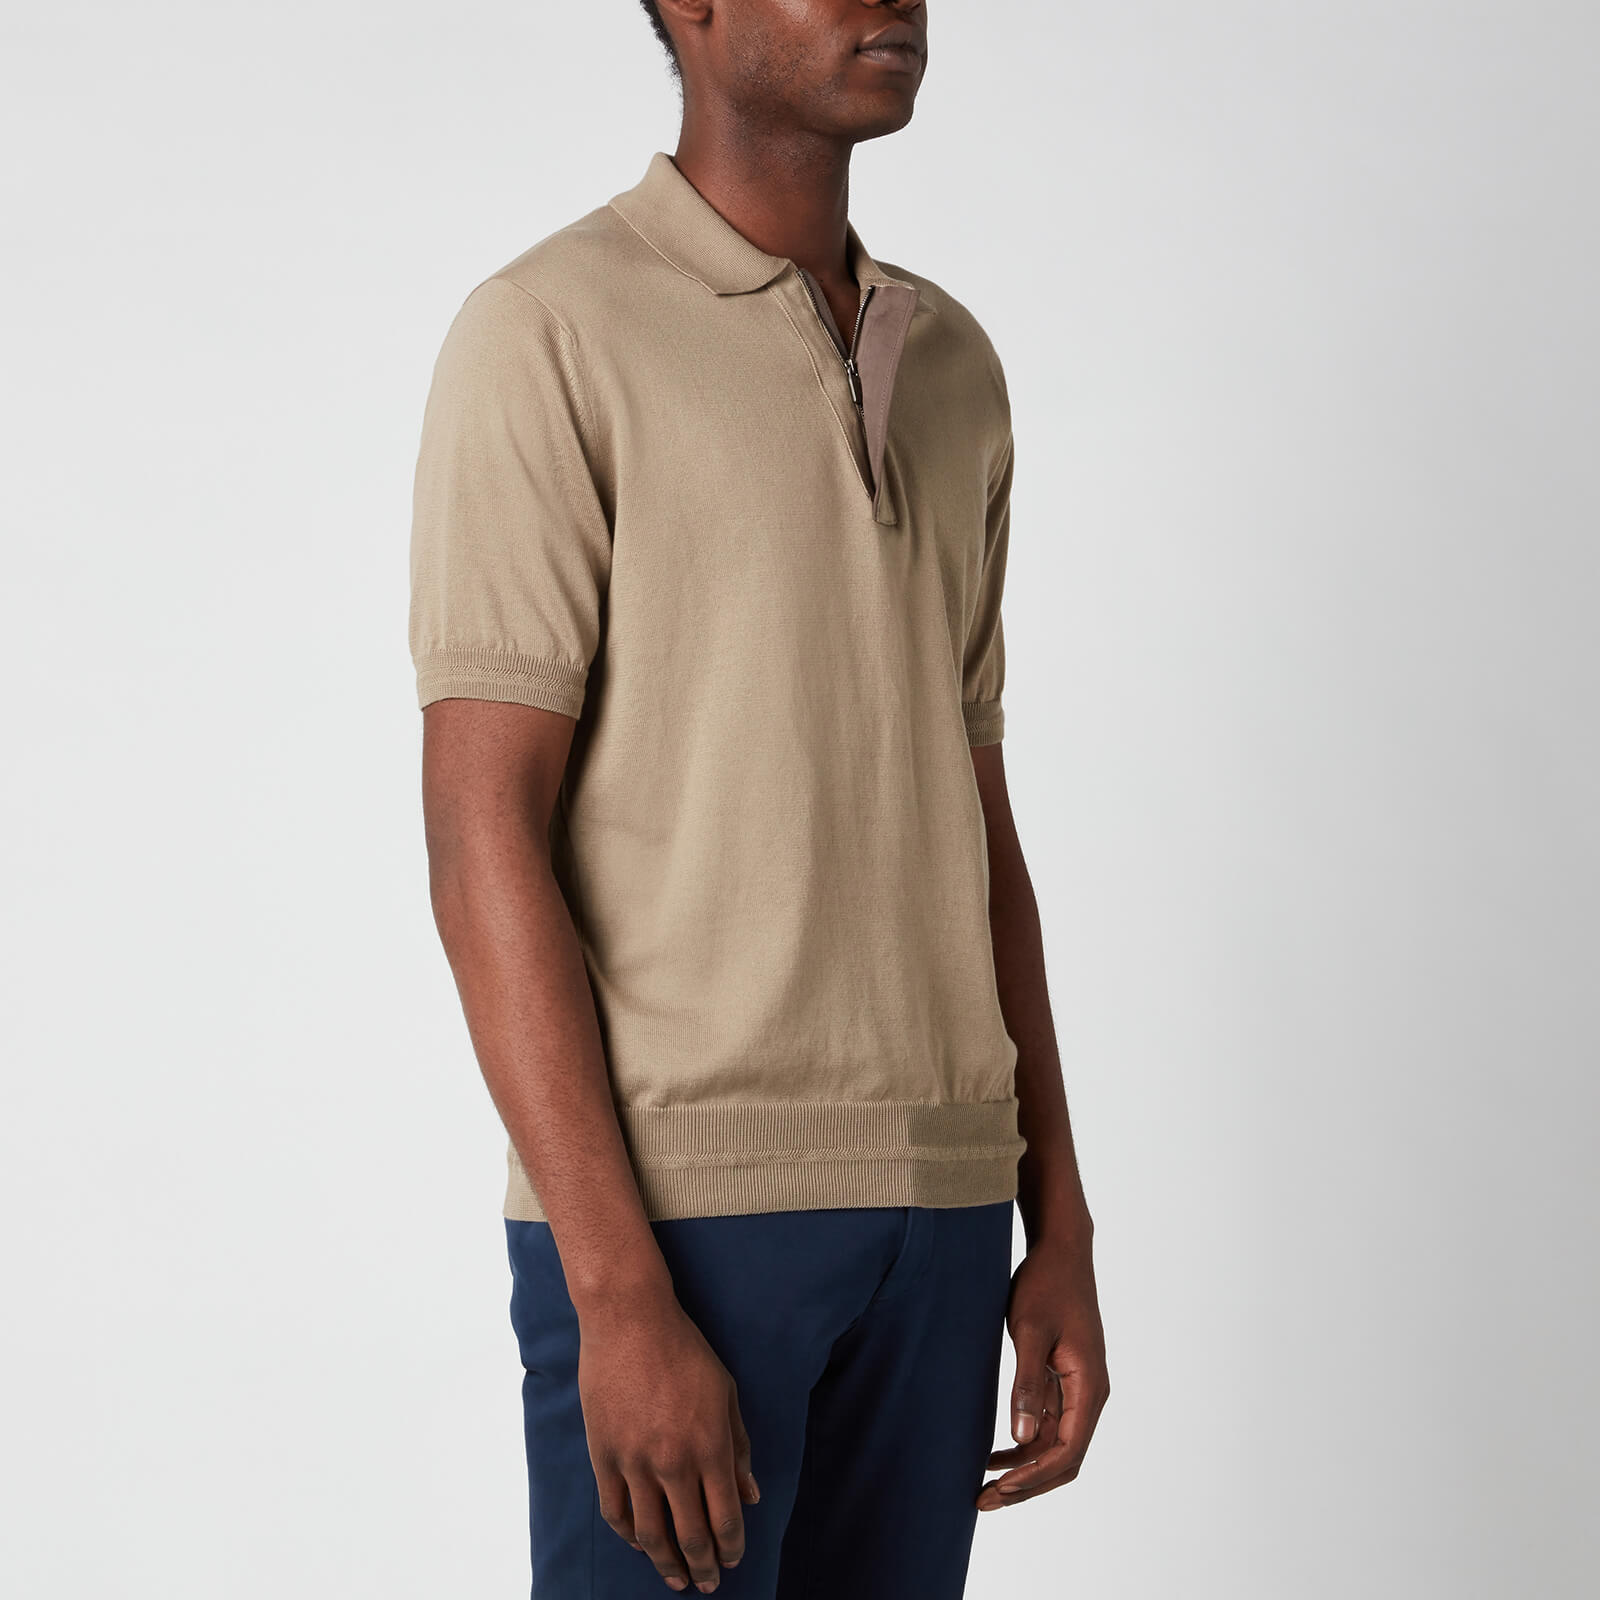 Canali Men's Suede Trim Polo Shirt - Khaki - It 54/Xxl